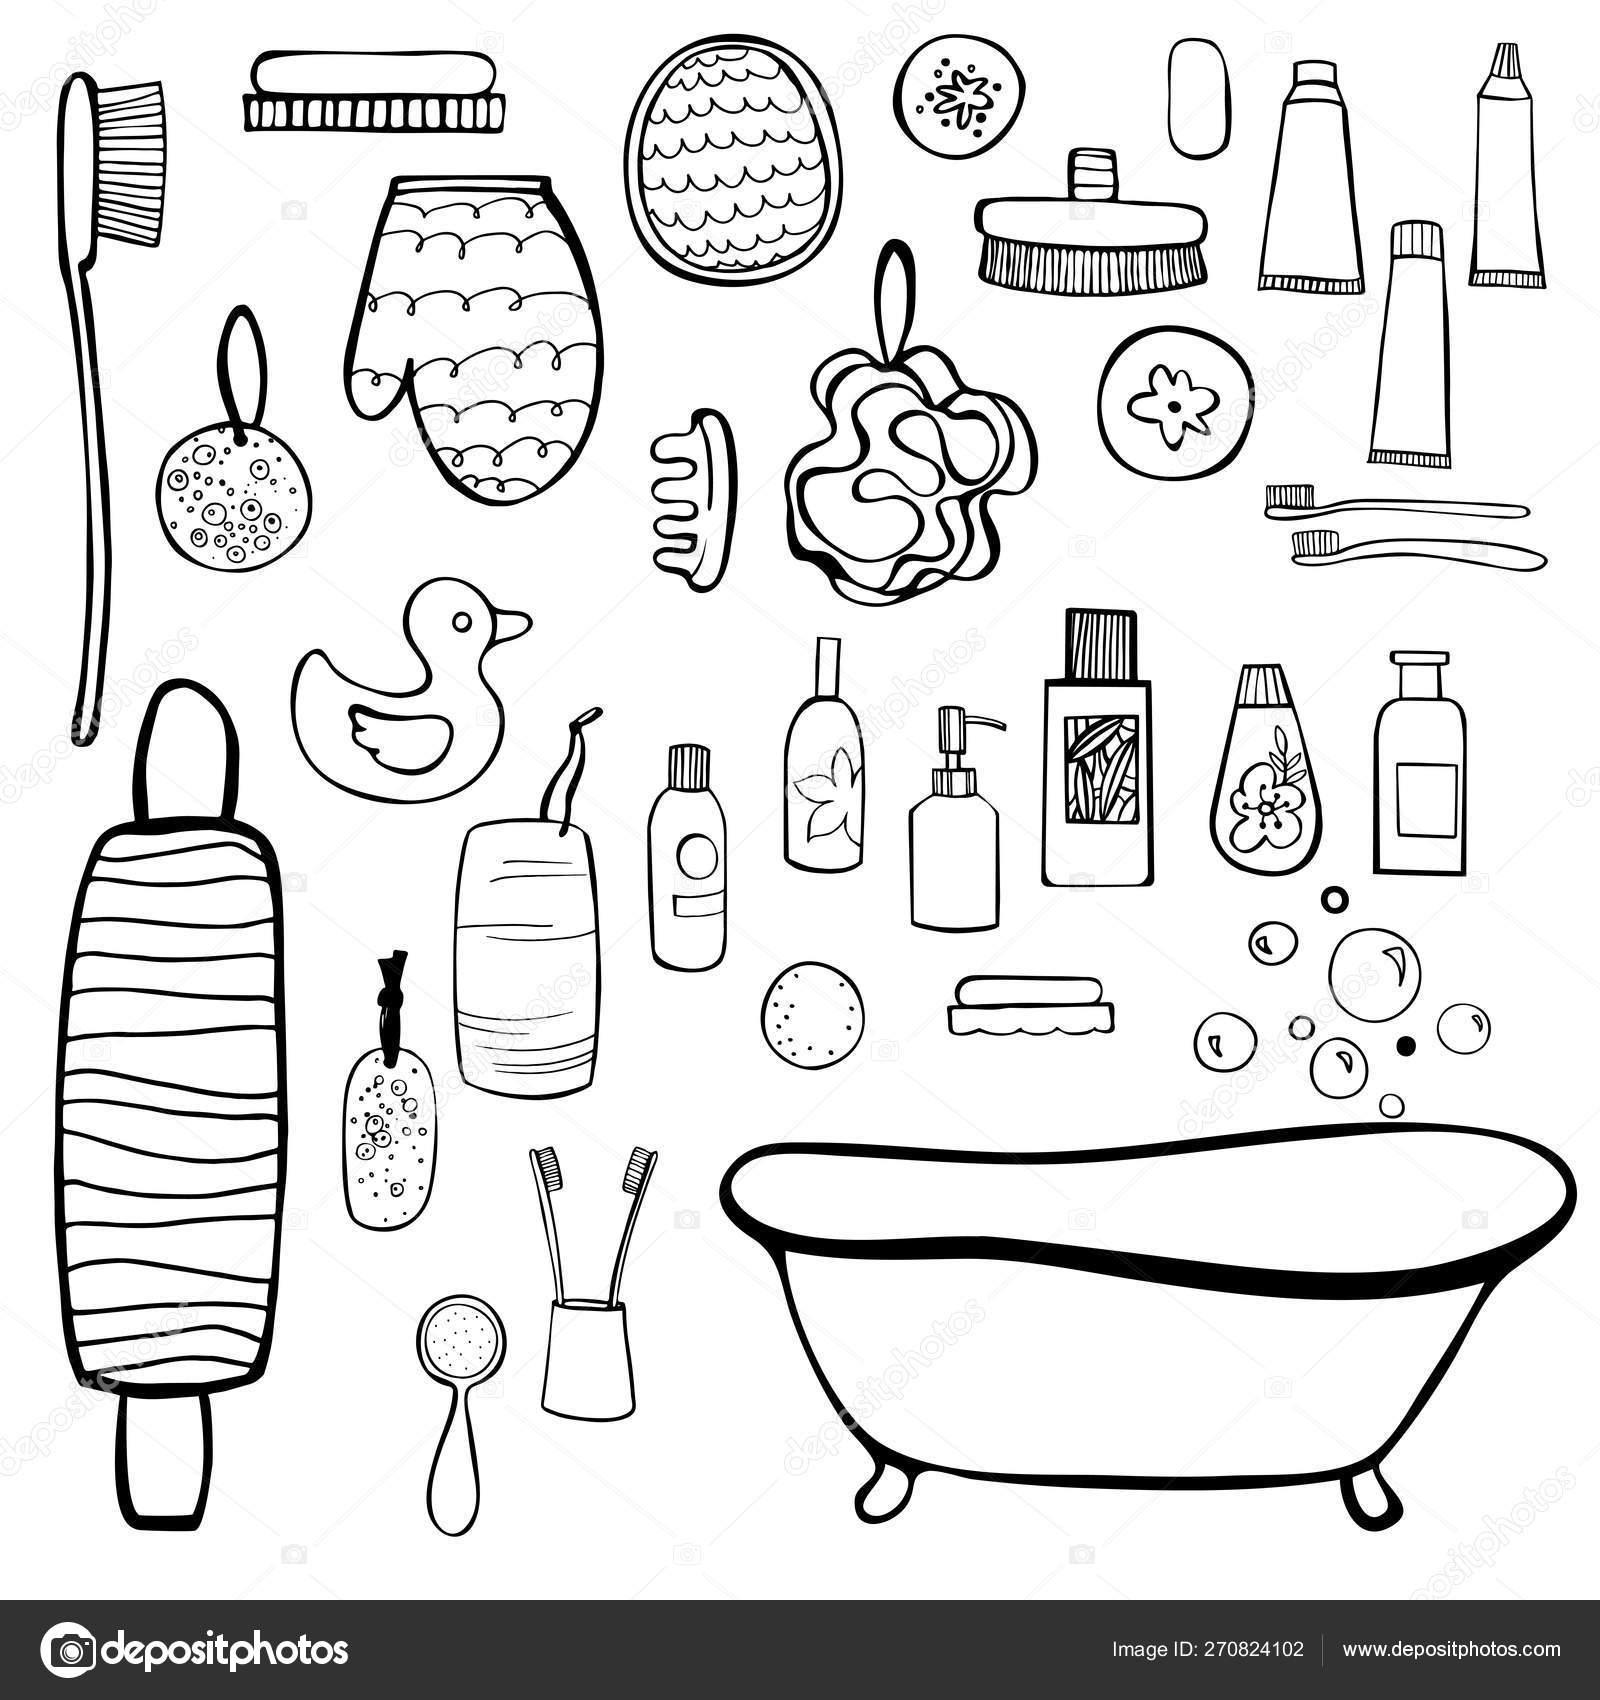 Bath Set Bathroom Items Vector Sketch Illustration Stock Vector C Rraya 270824102